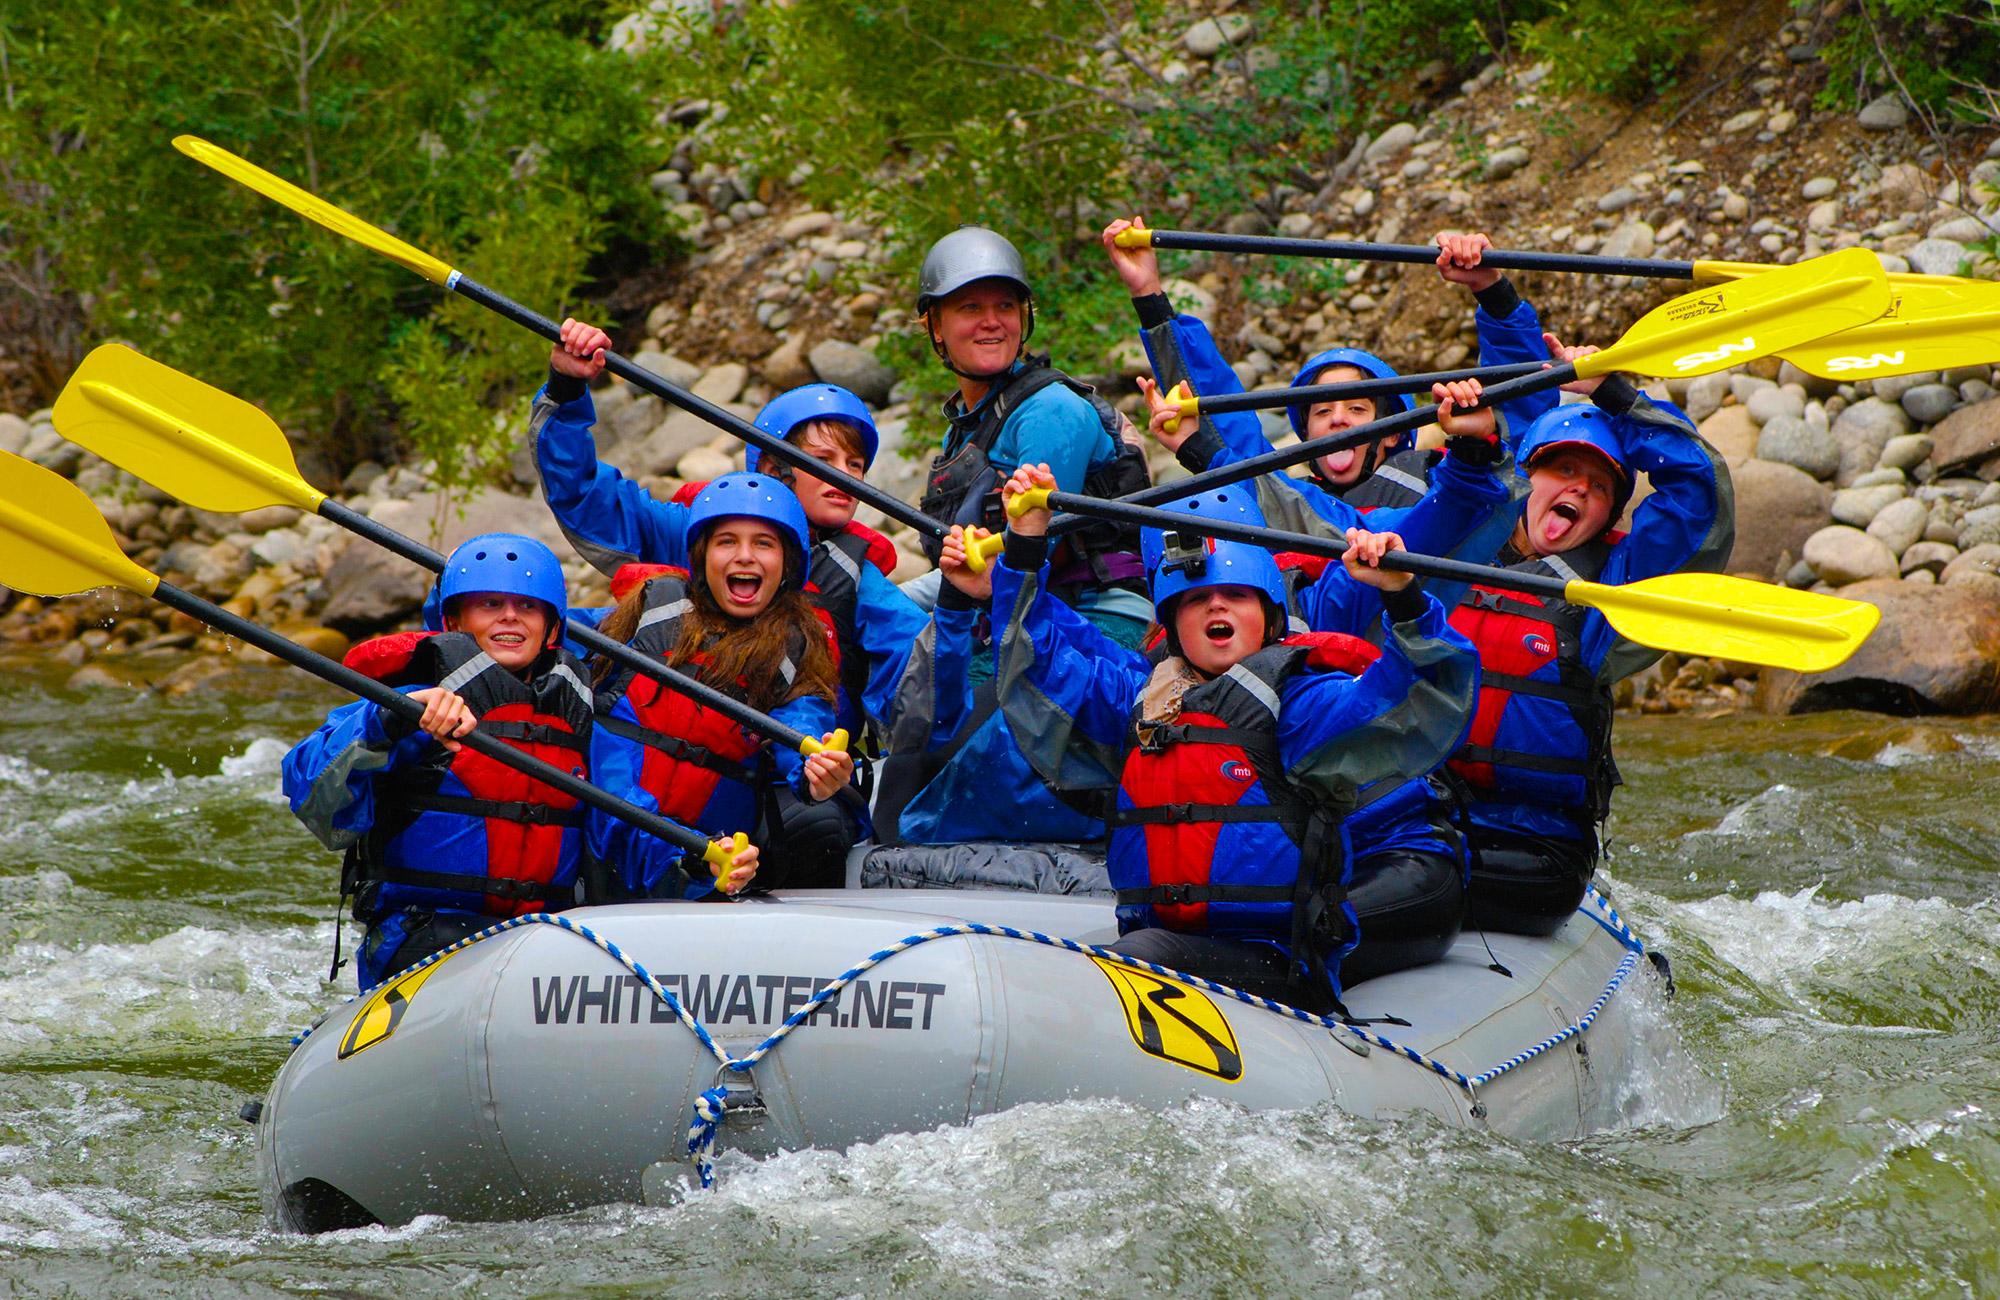 moondance white water rafting teen trip